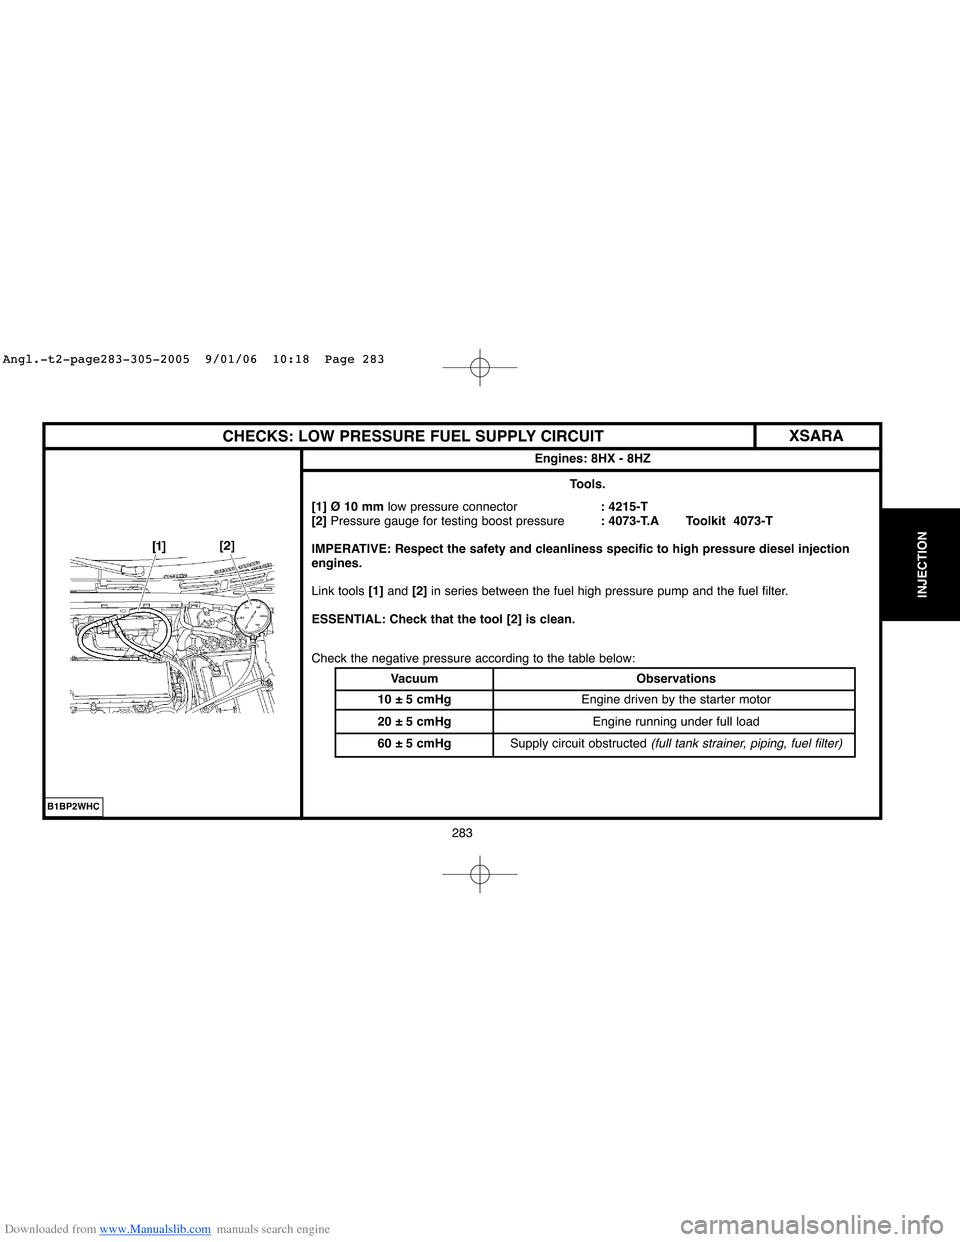 Citroen BERLINGO 2005 1.G Workshop Manual, Page 289